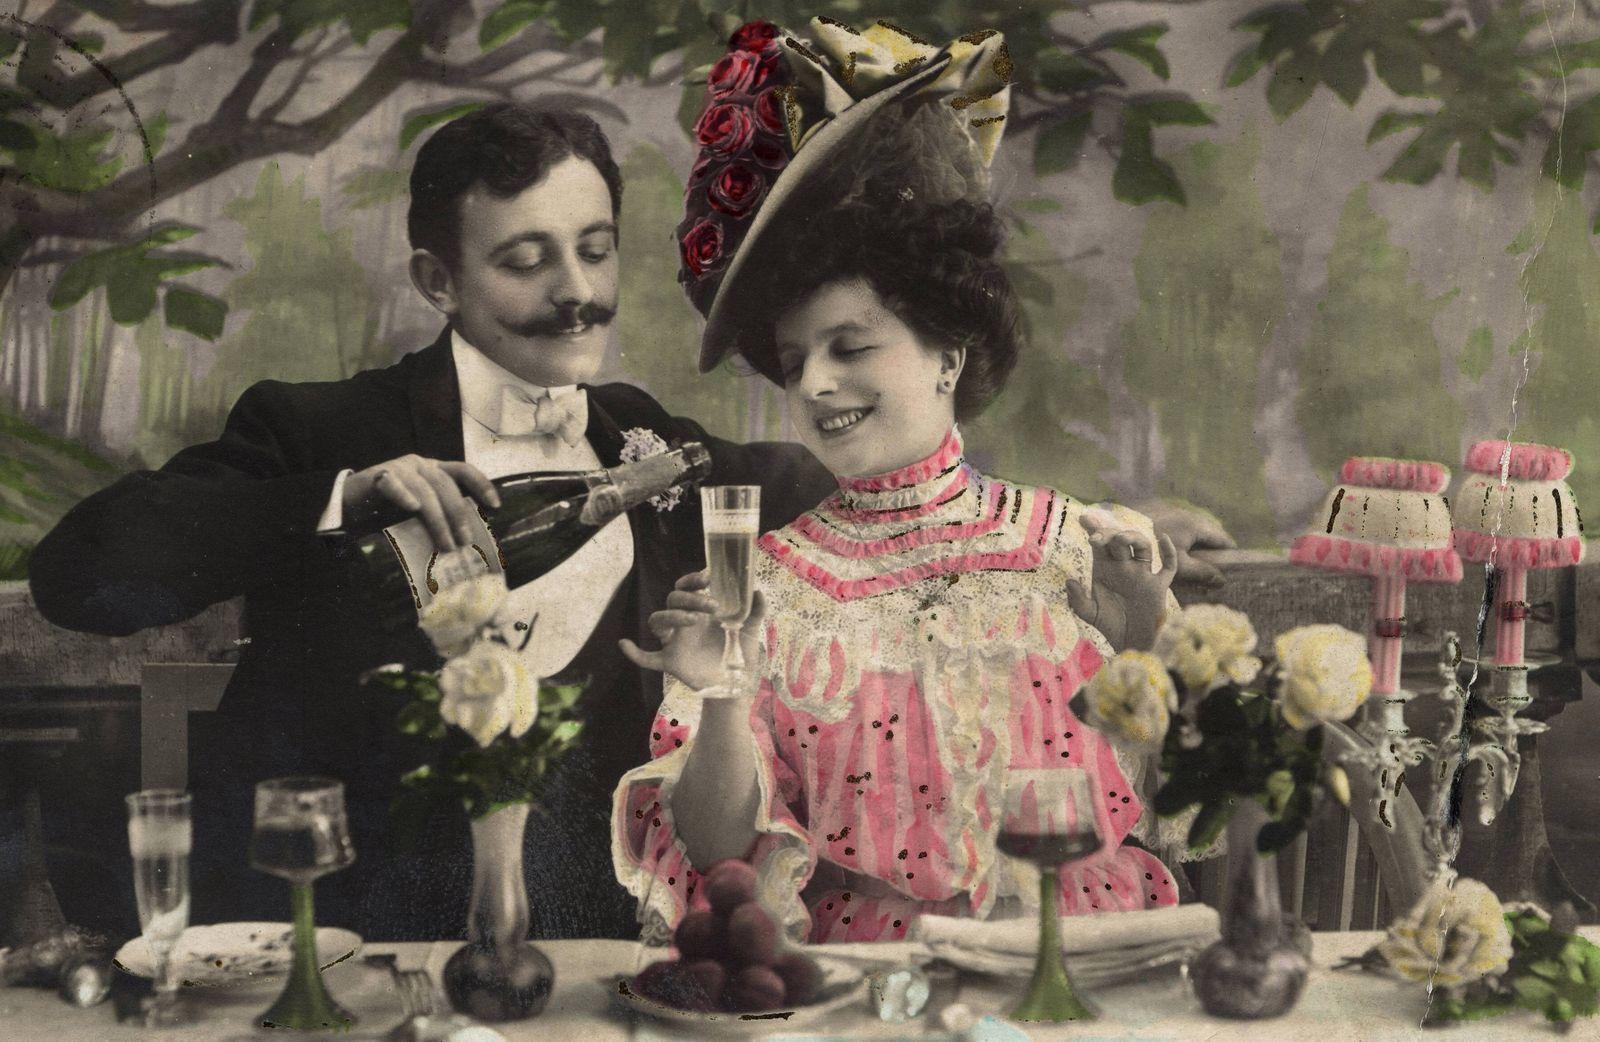 Couple of lovers french Postcard c 1910 Champagne AUFNAHMEDATUM GESCH?TZT PUBLICATIONxINxG